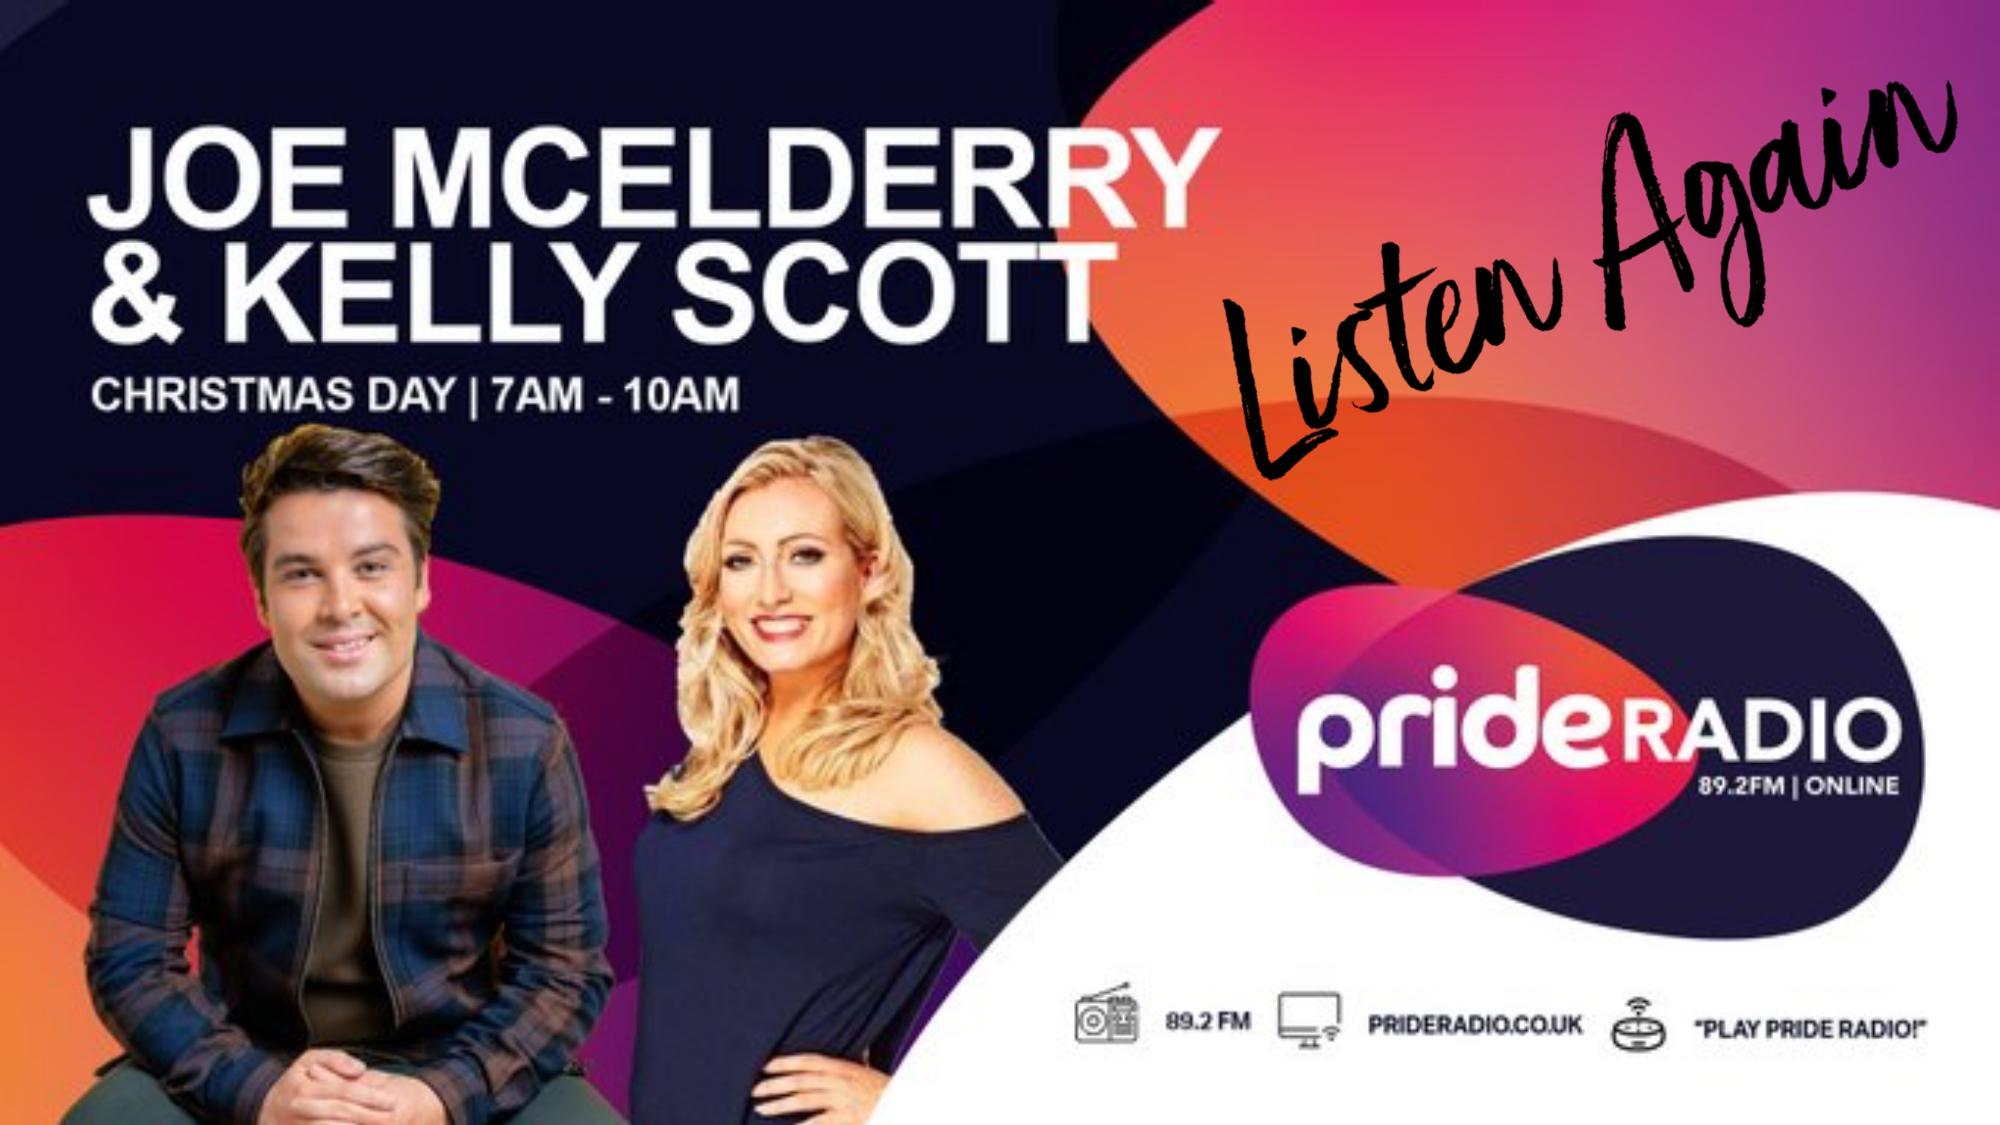 Listen Again with Joe McElderry & Kelly Scott Christmas Day